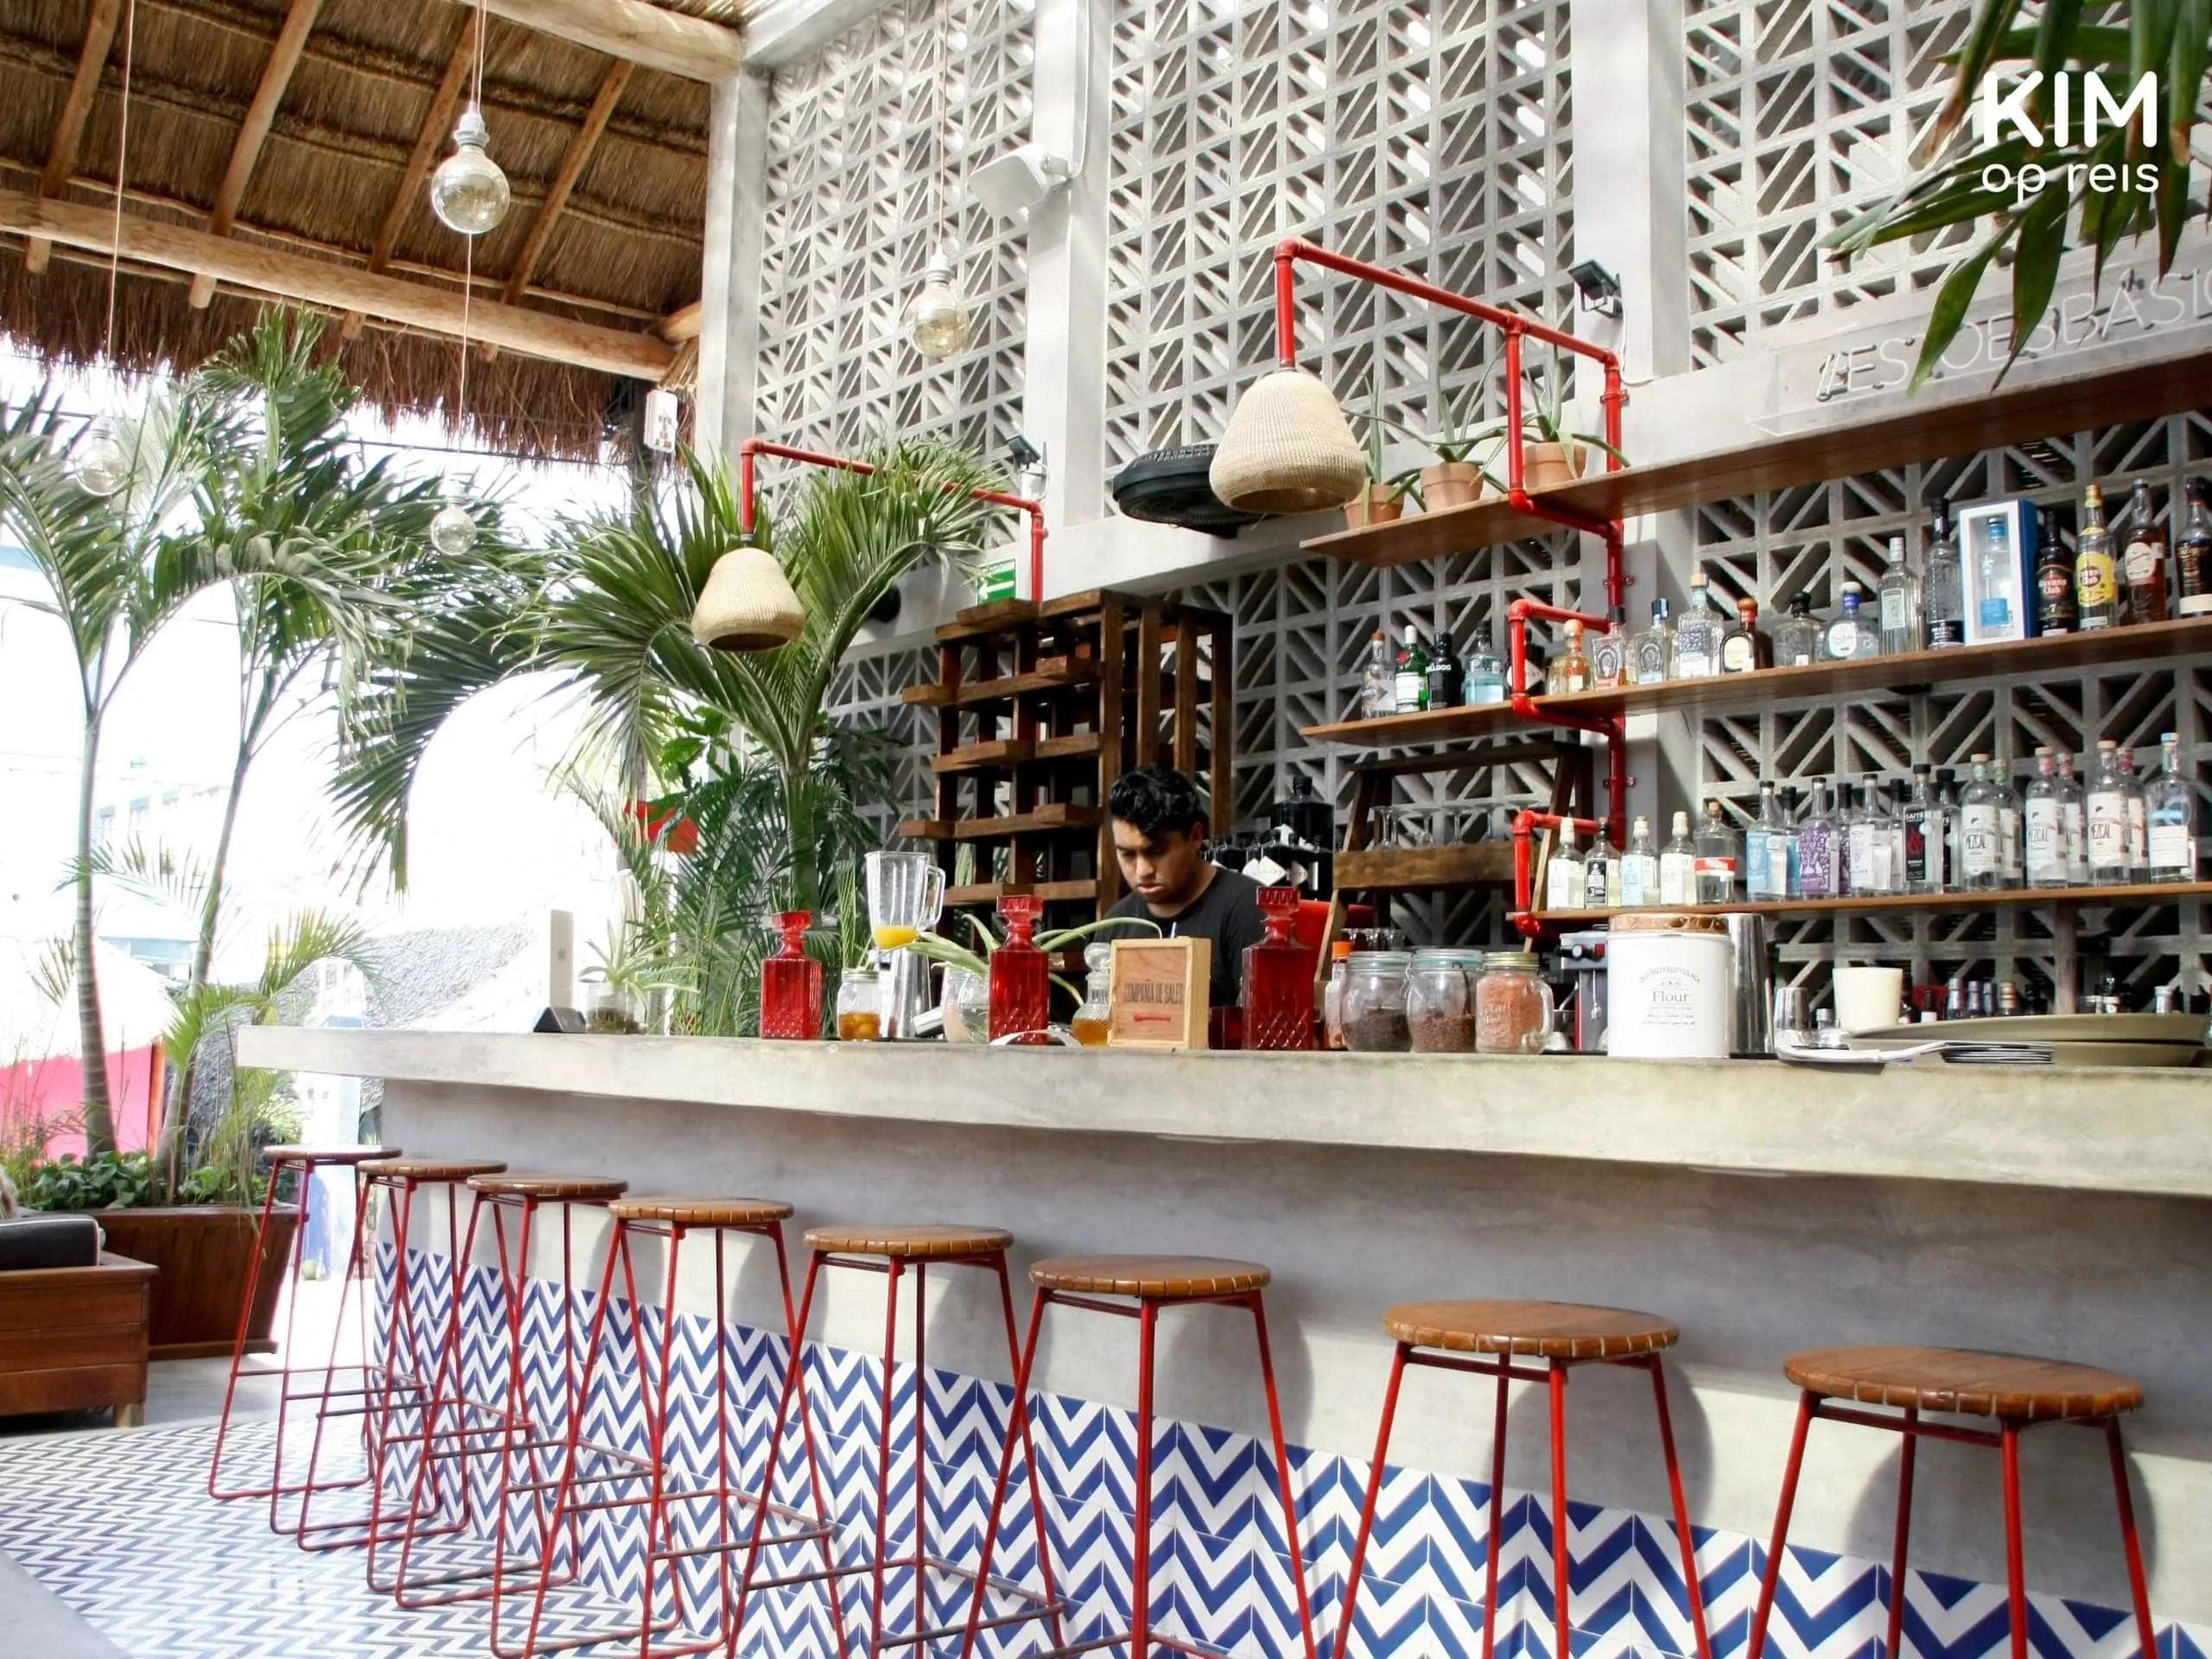 Isla Holbox Basico bar: bar met krukken van restaurant Basico